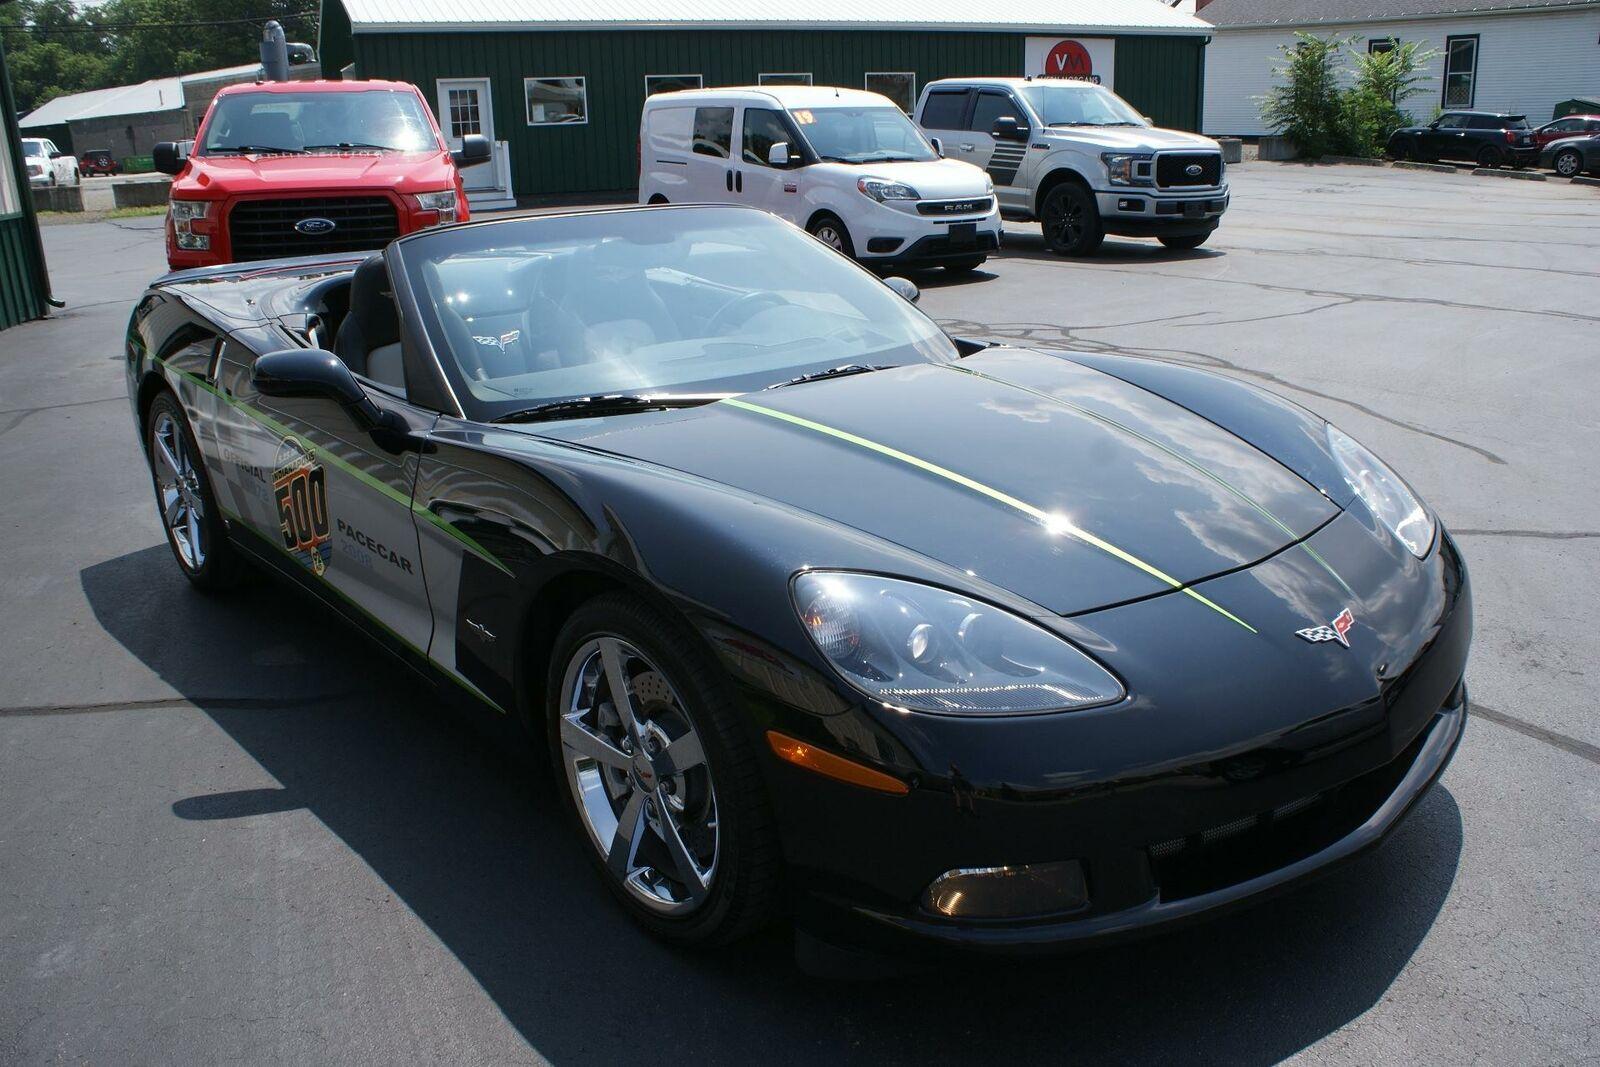 2008 Black Chevrolet Corvette   | C6 Corvette Photo 7